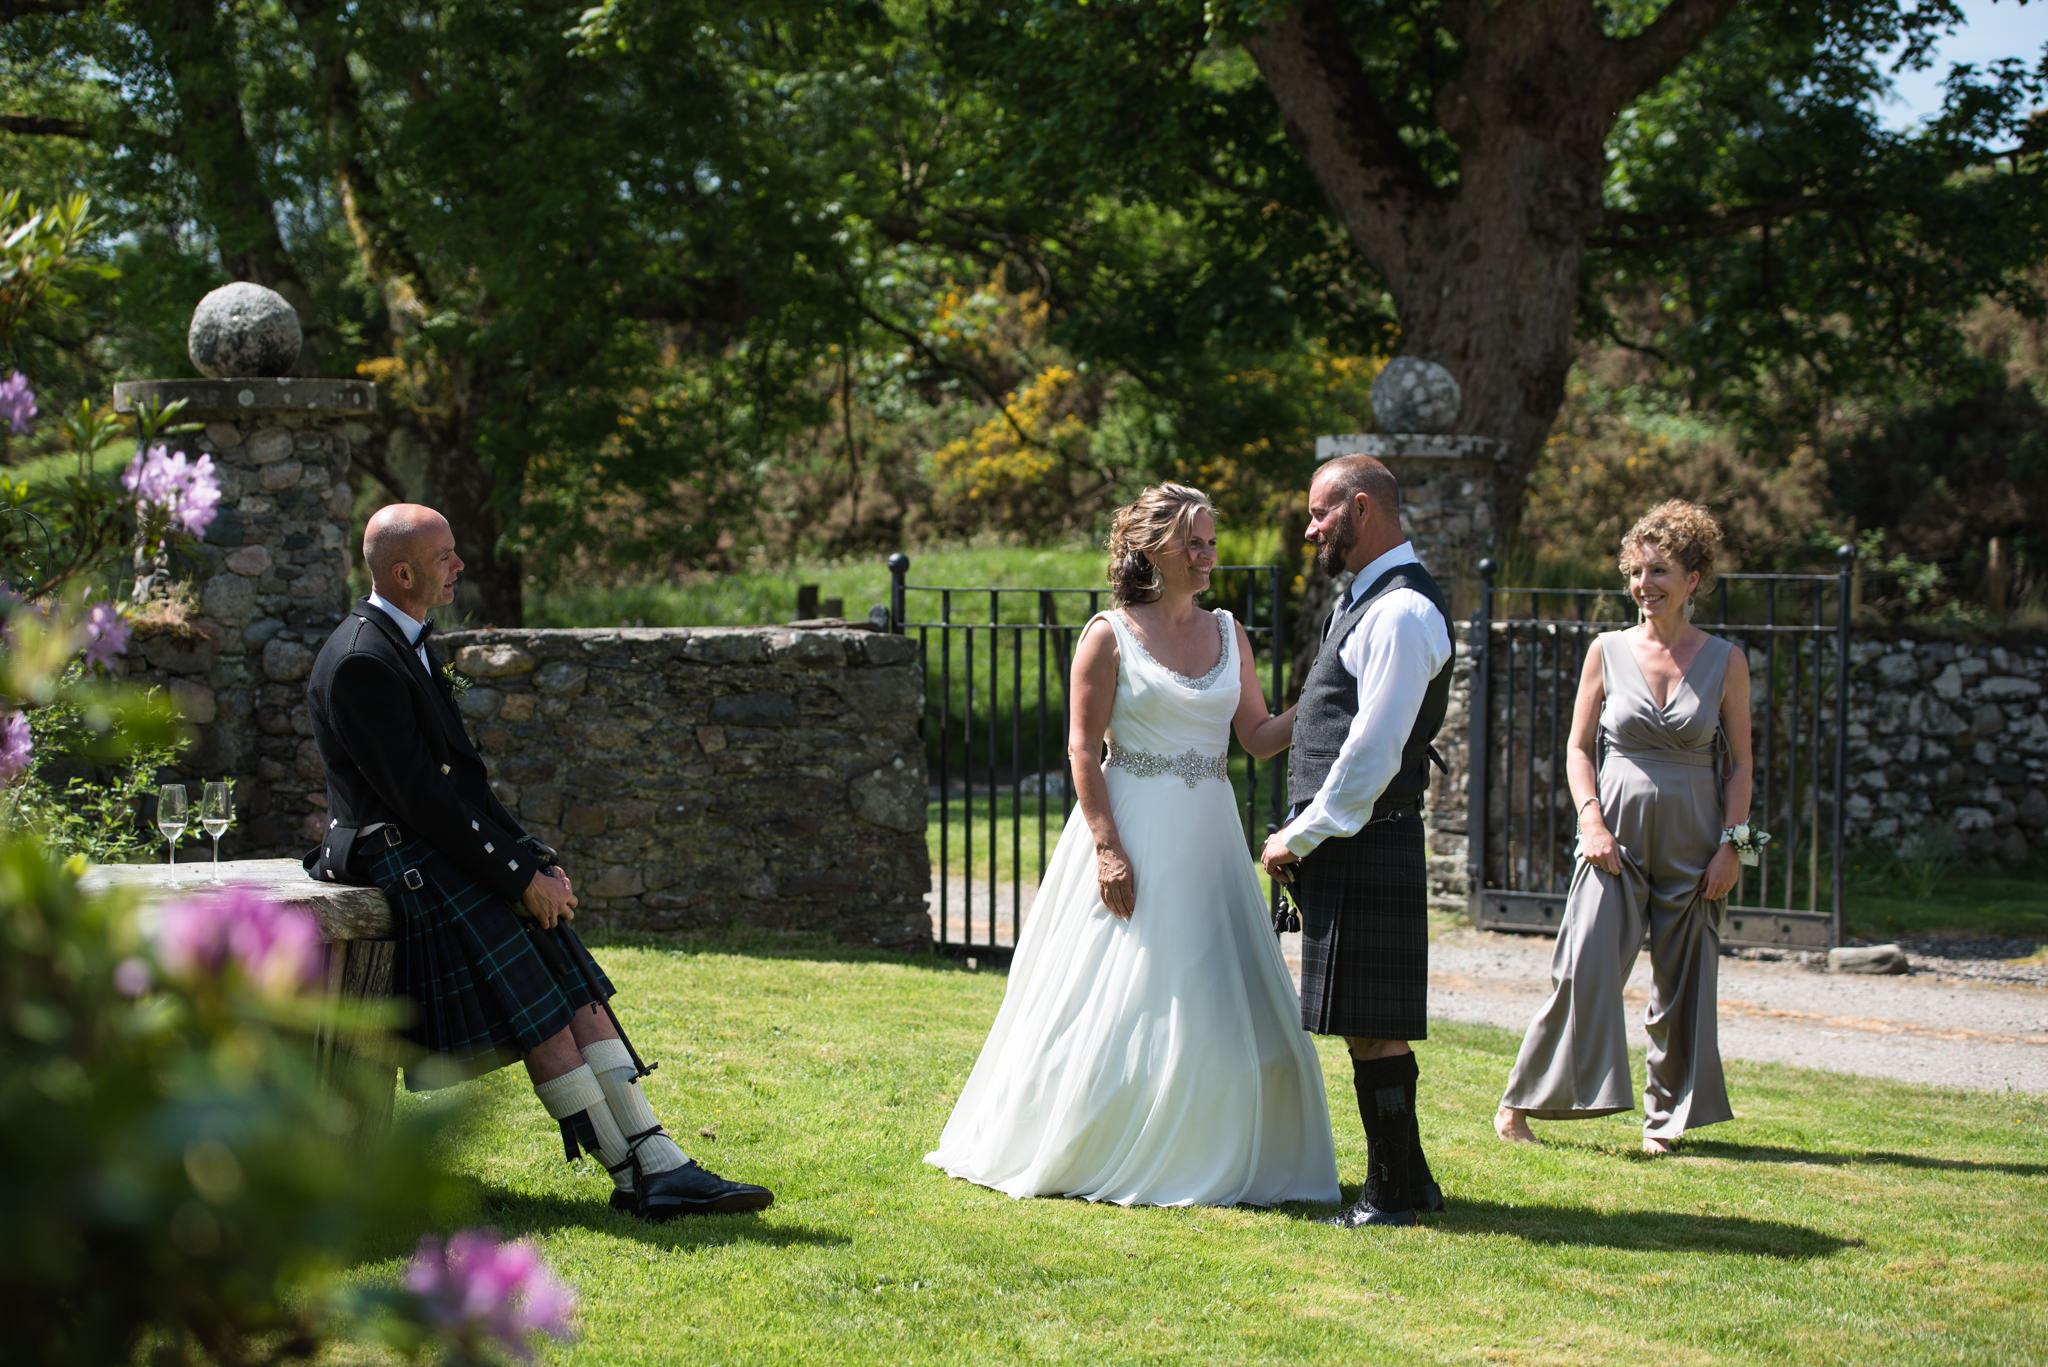 Amanda and Scott - wedding - Balcardine Castle - ©Julie Broadfoot - www.photographybyjuliebee.co.uk